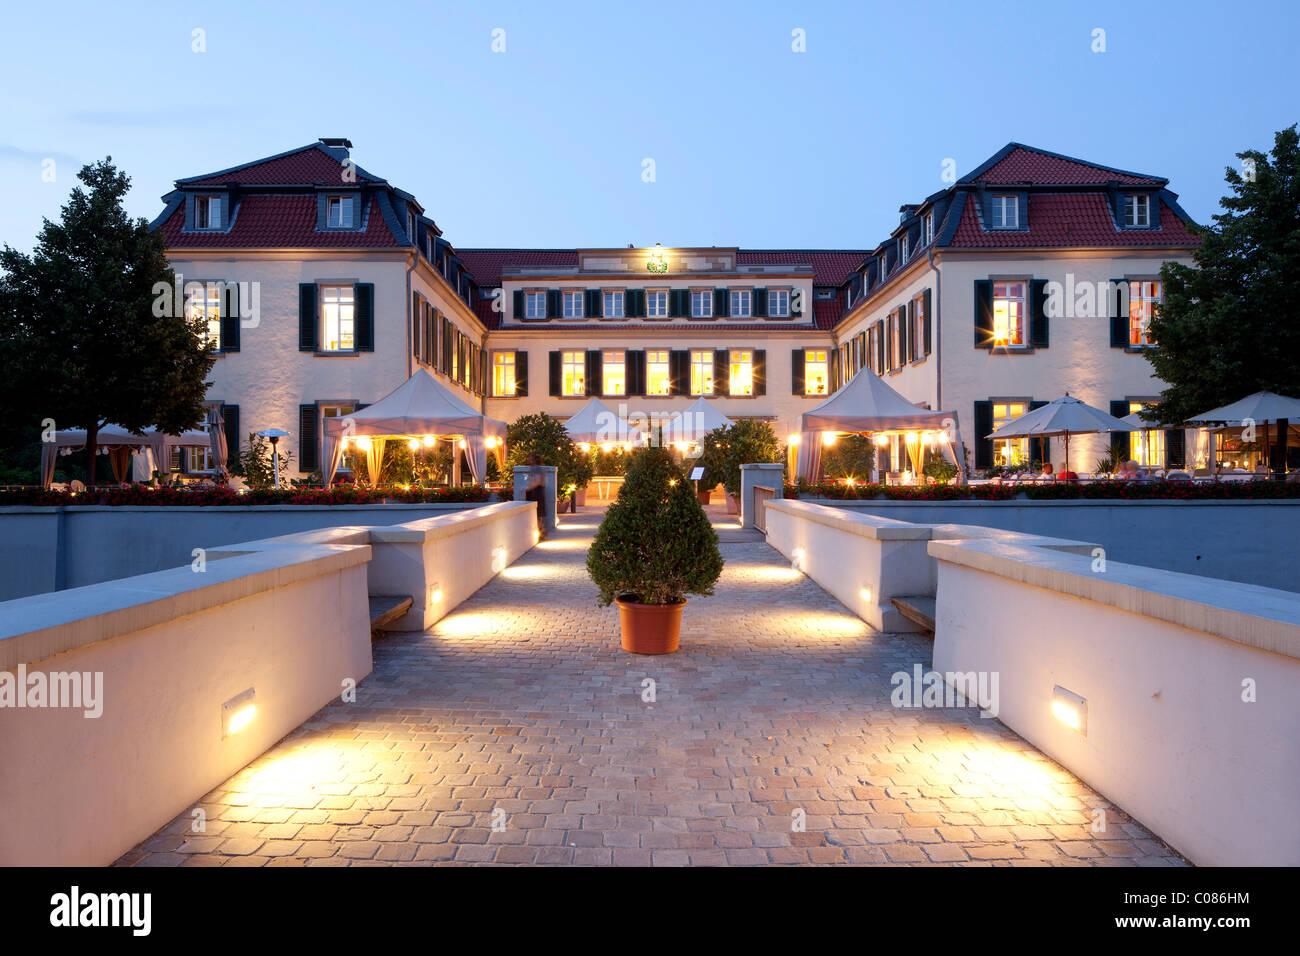 Schloss Berge Palace, Gelsenkirchen, Ruhr Area, North Rhine-Westphalia, Germany, Europe - Stock Image